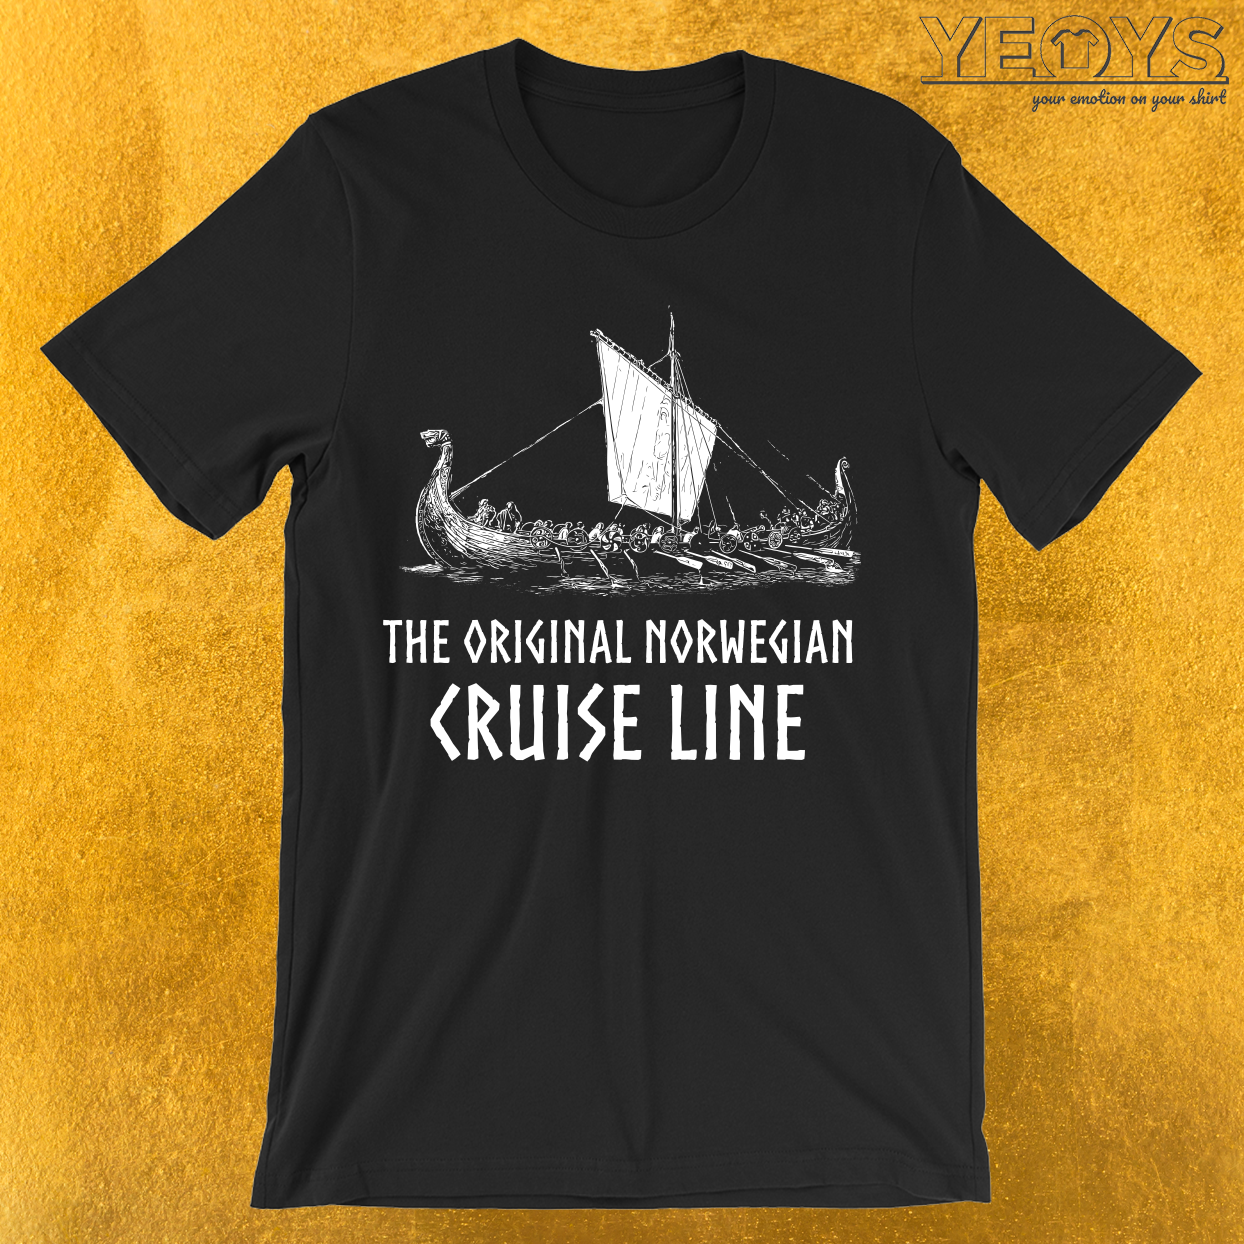 Viking Ship Cruise Line T-Shirt